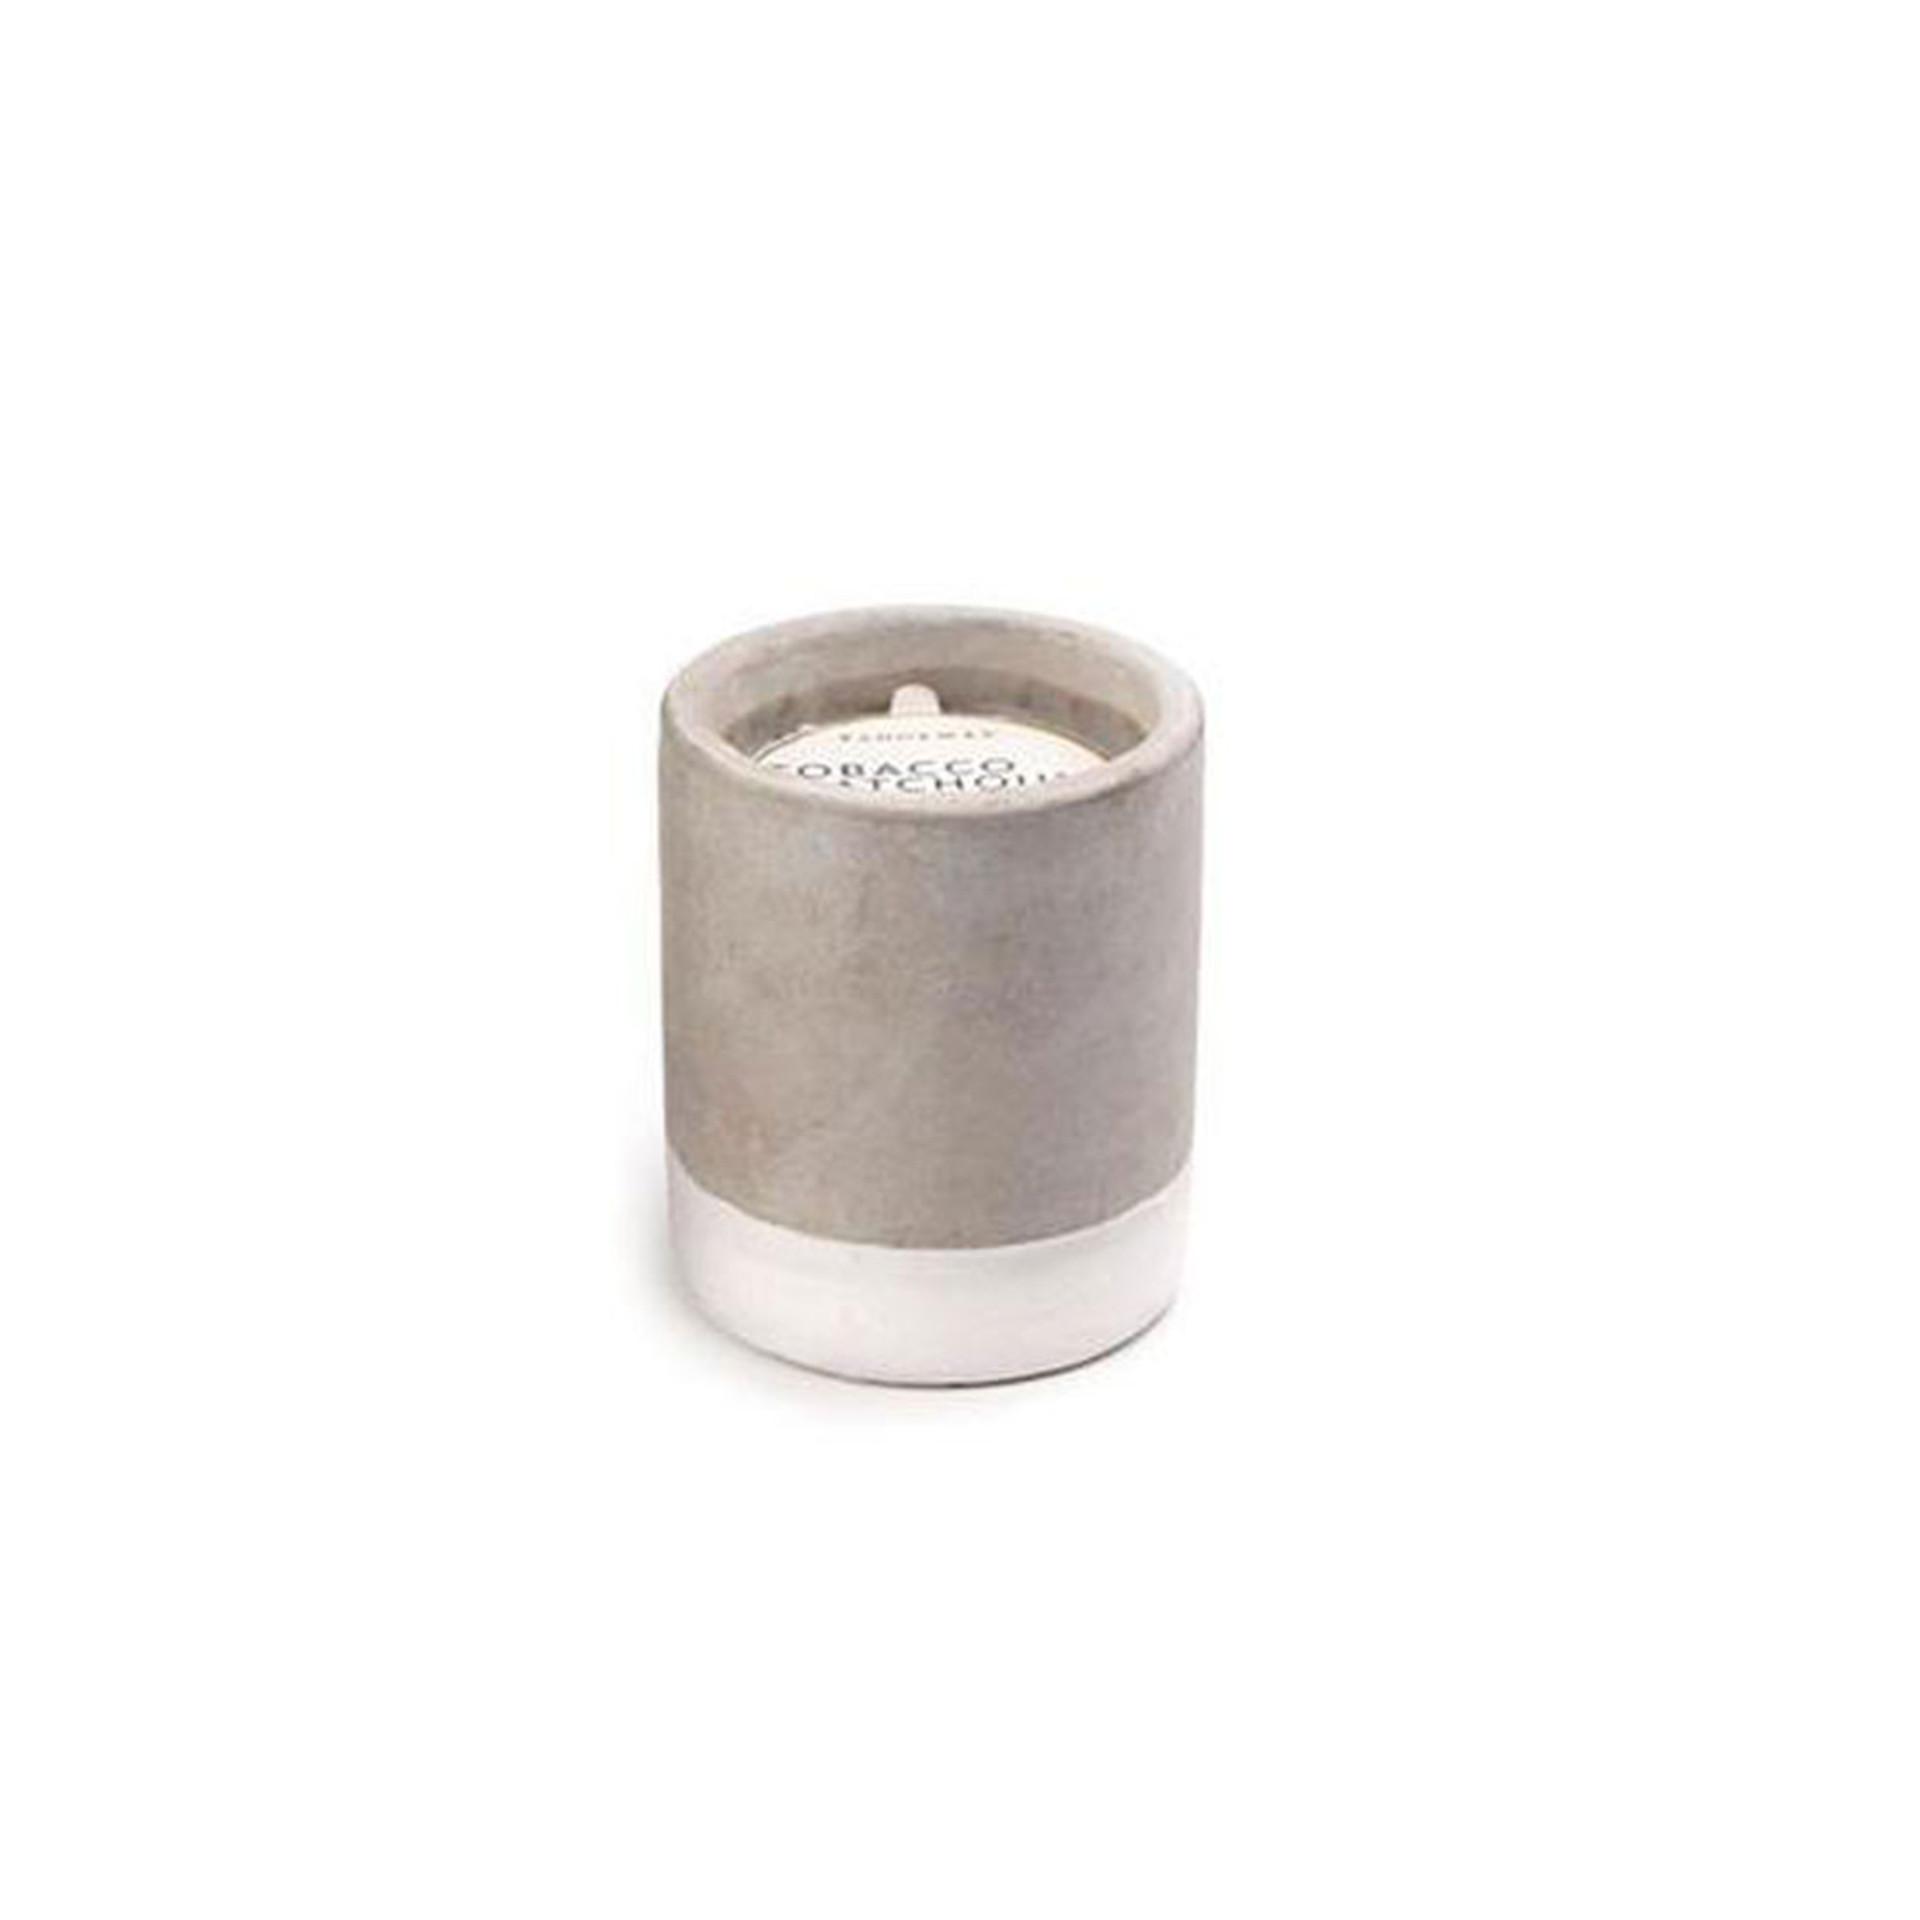 Paddywax Tobacco Patchouli Urban Candle 3.5oz